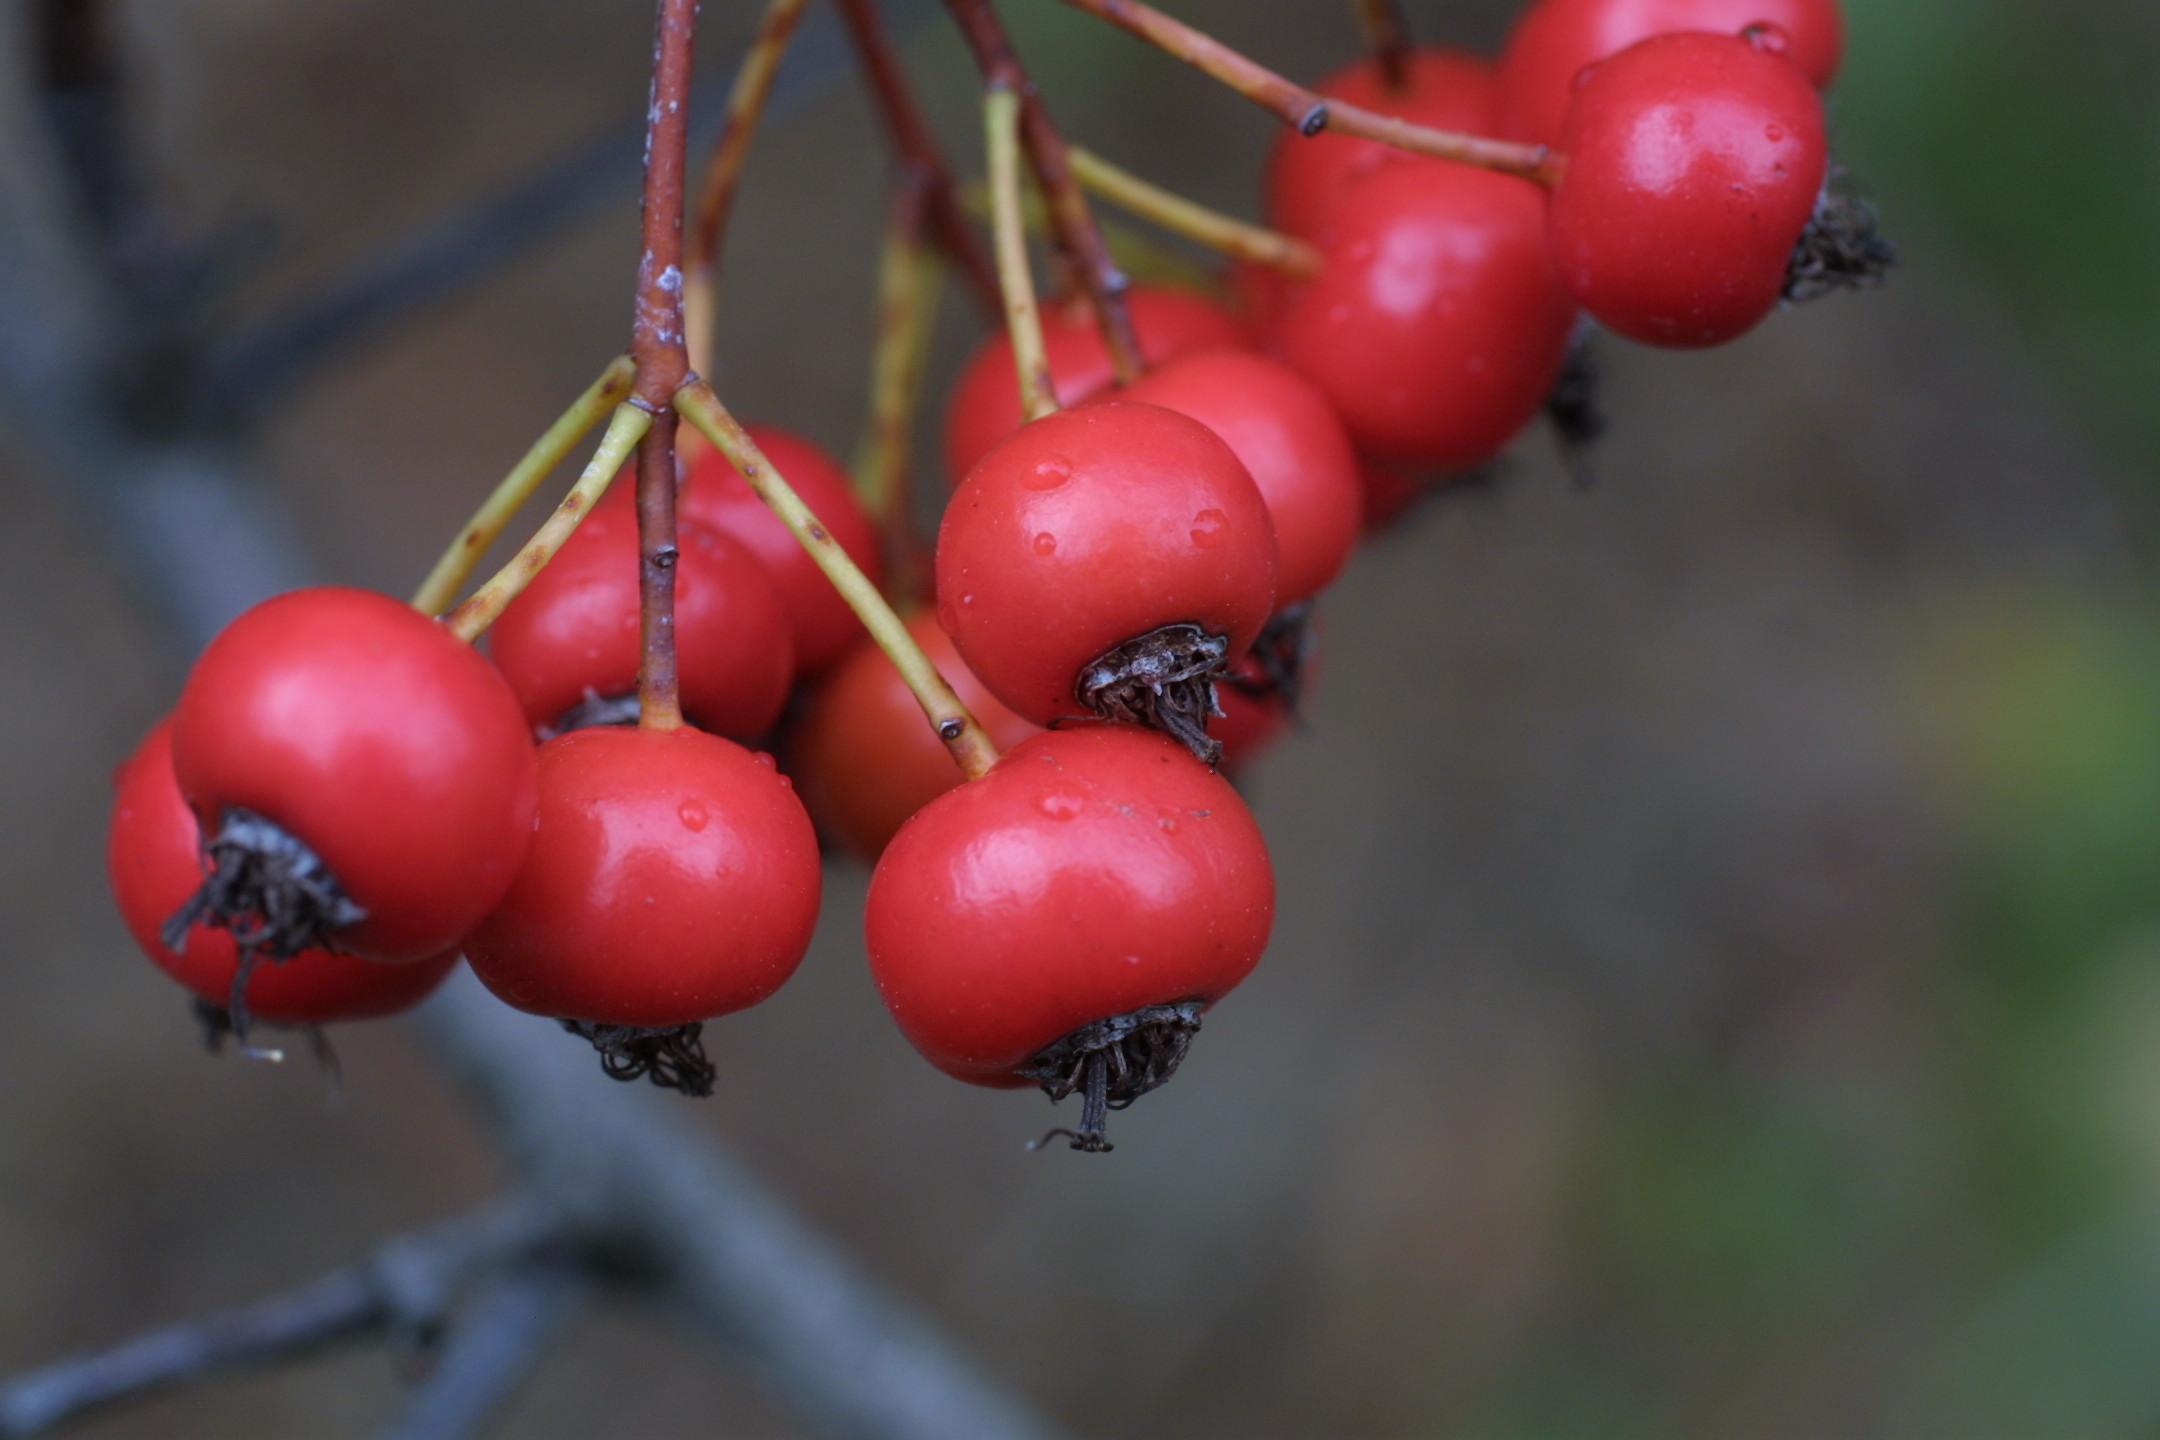 crataegus vrucht